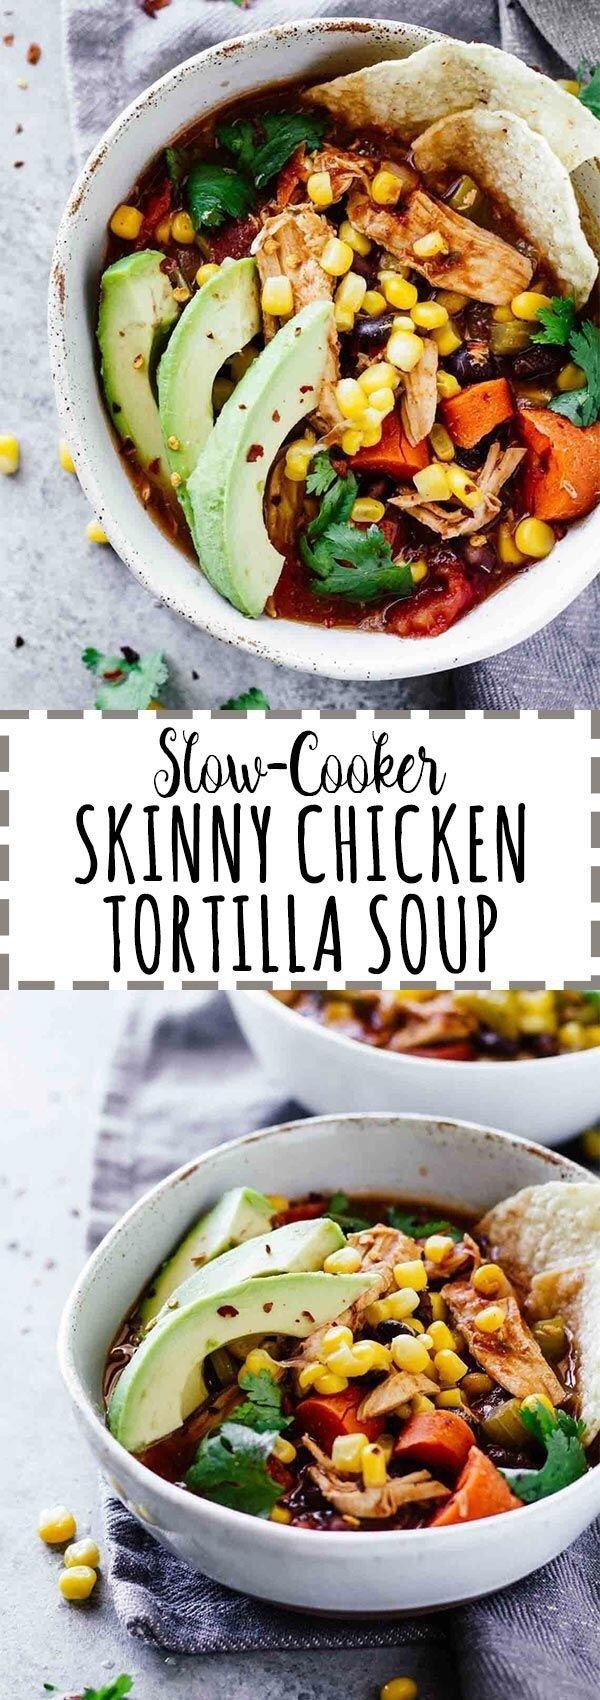 27 Healthy Crockpot Recipes #healthycrockpotchickenrecipes